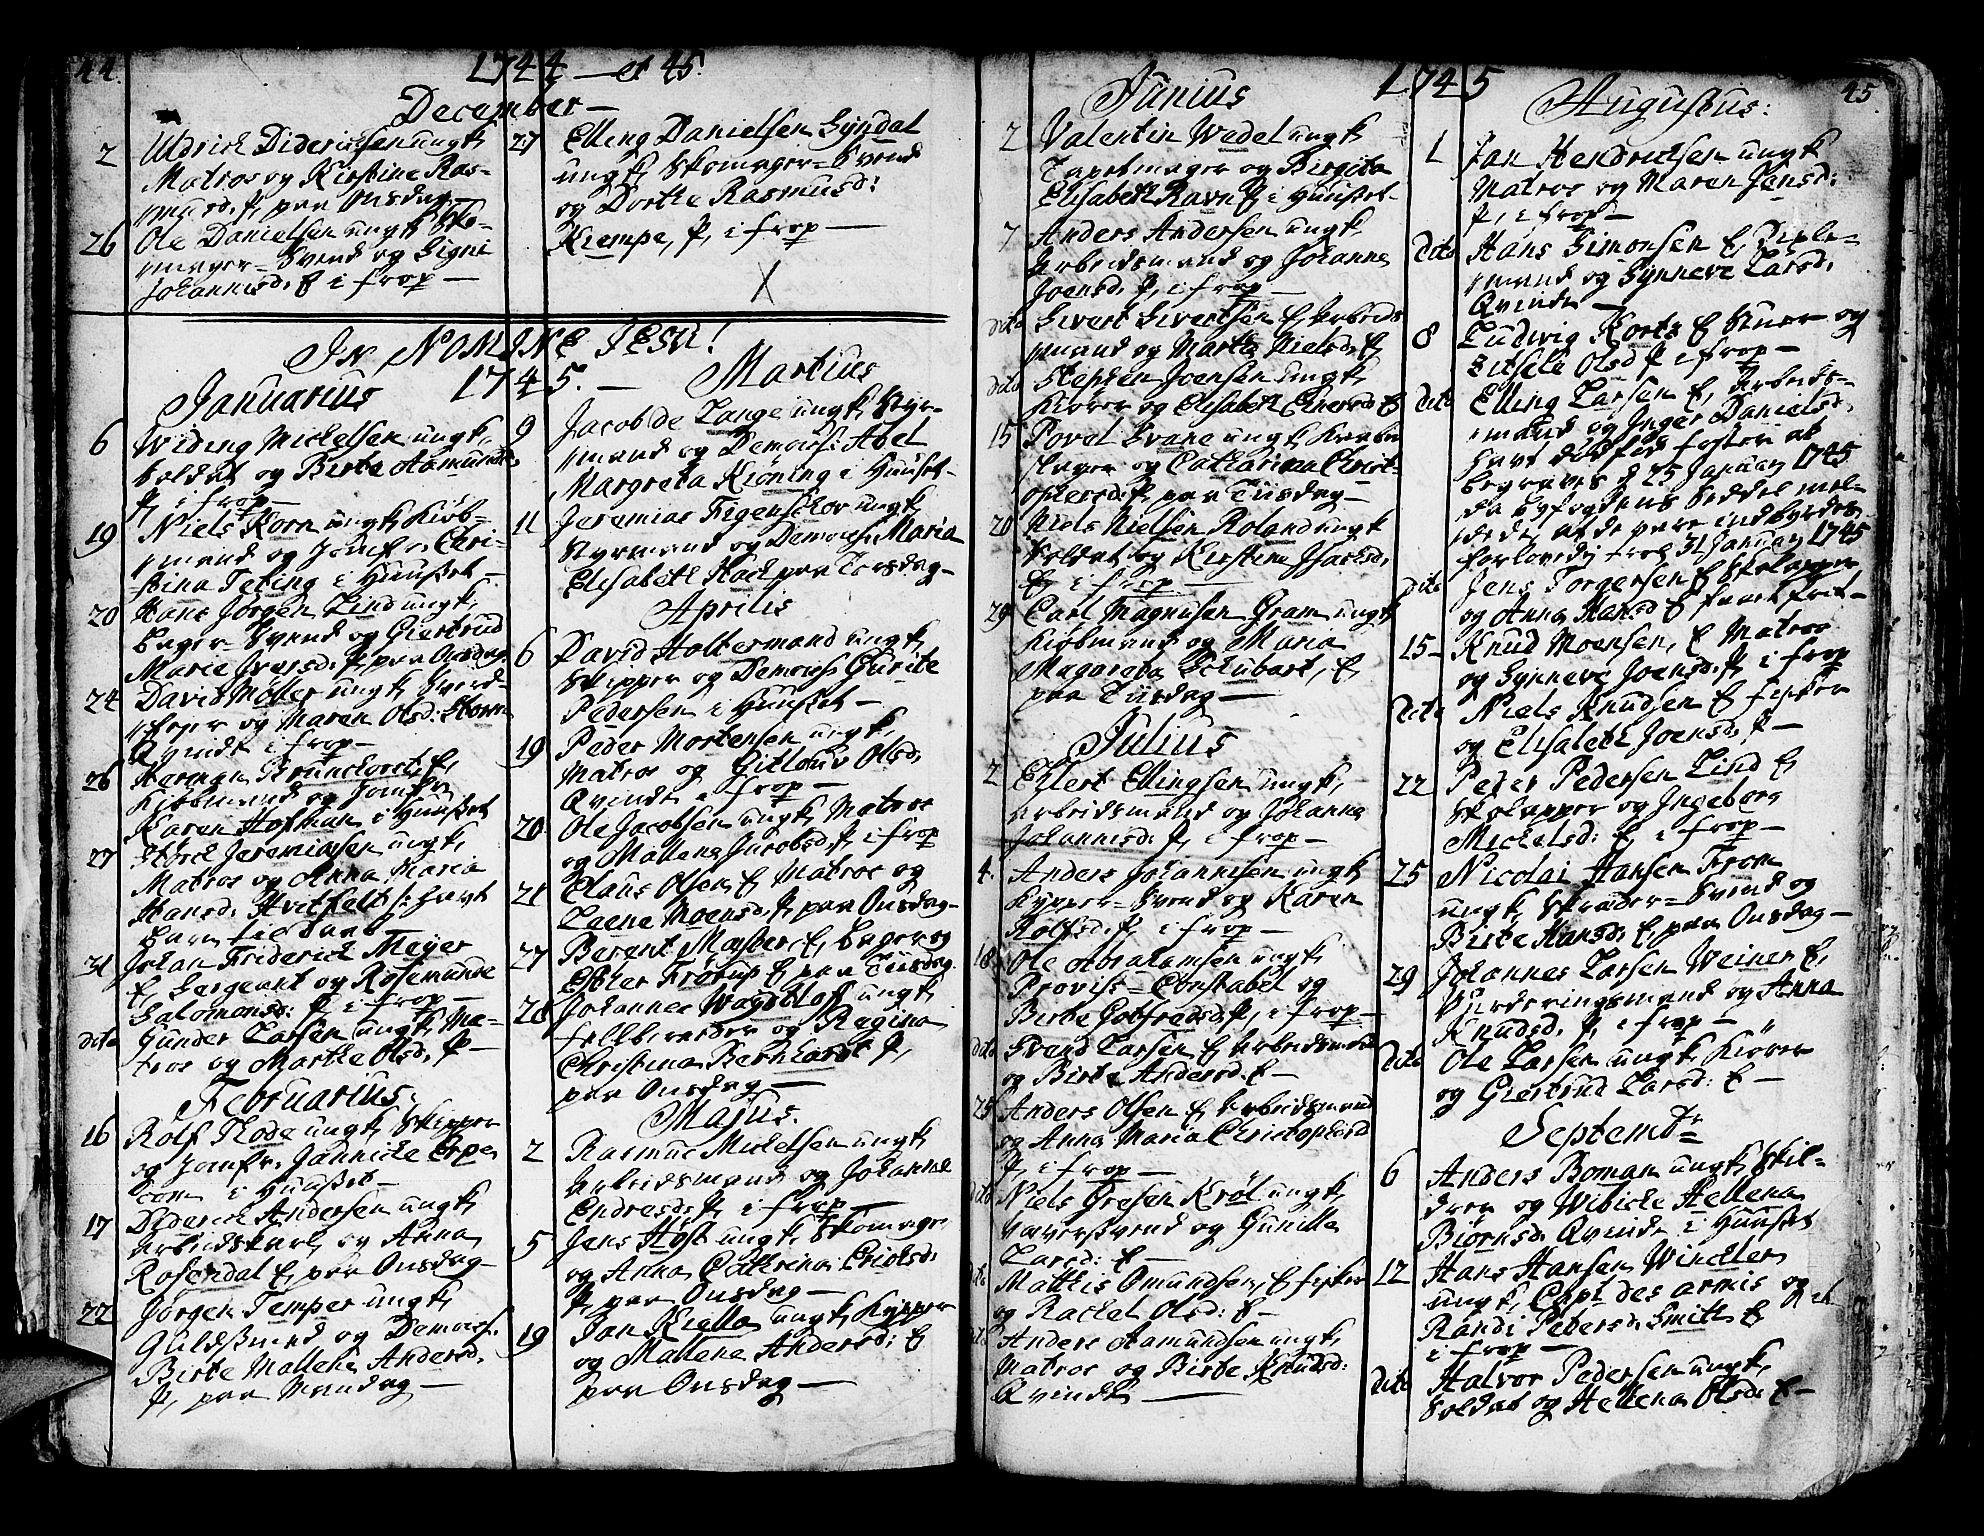 SAB, Domkirken sokneprestembete, H/Haa/L0007: Parish register (official) no. A 7, 1725-1826, p. 44-45